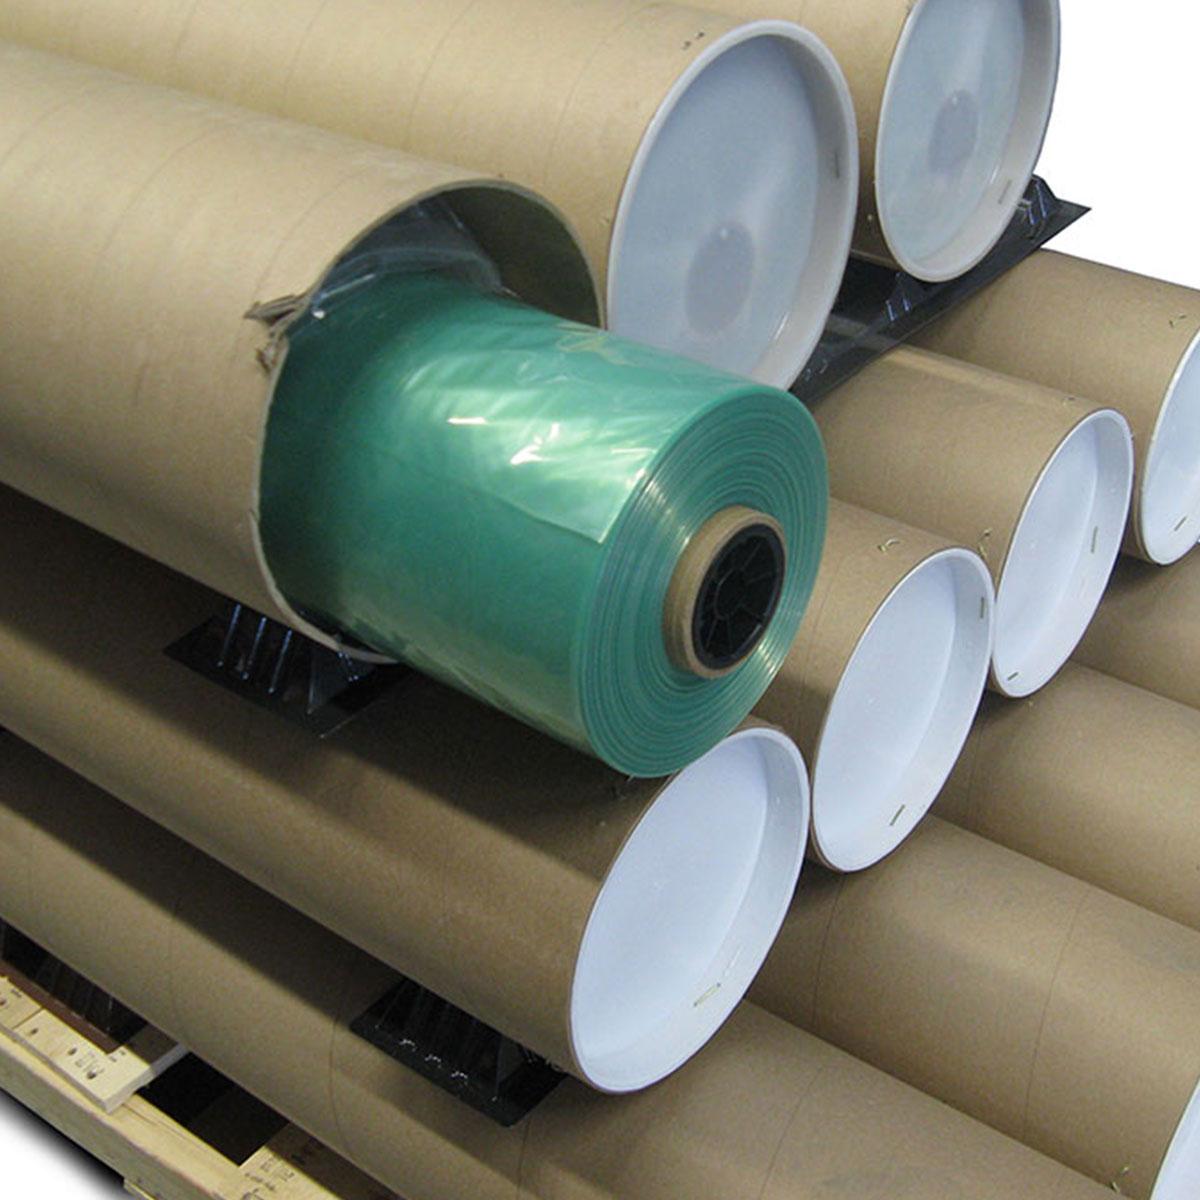 vakuum sack nylon 1500 grn lft 0076mm x 1500mm 600m 0003 x 60